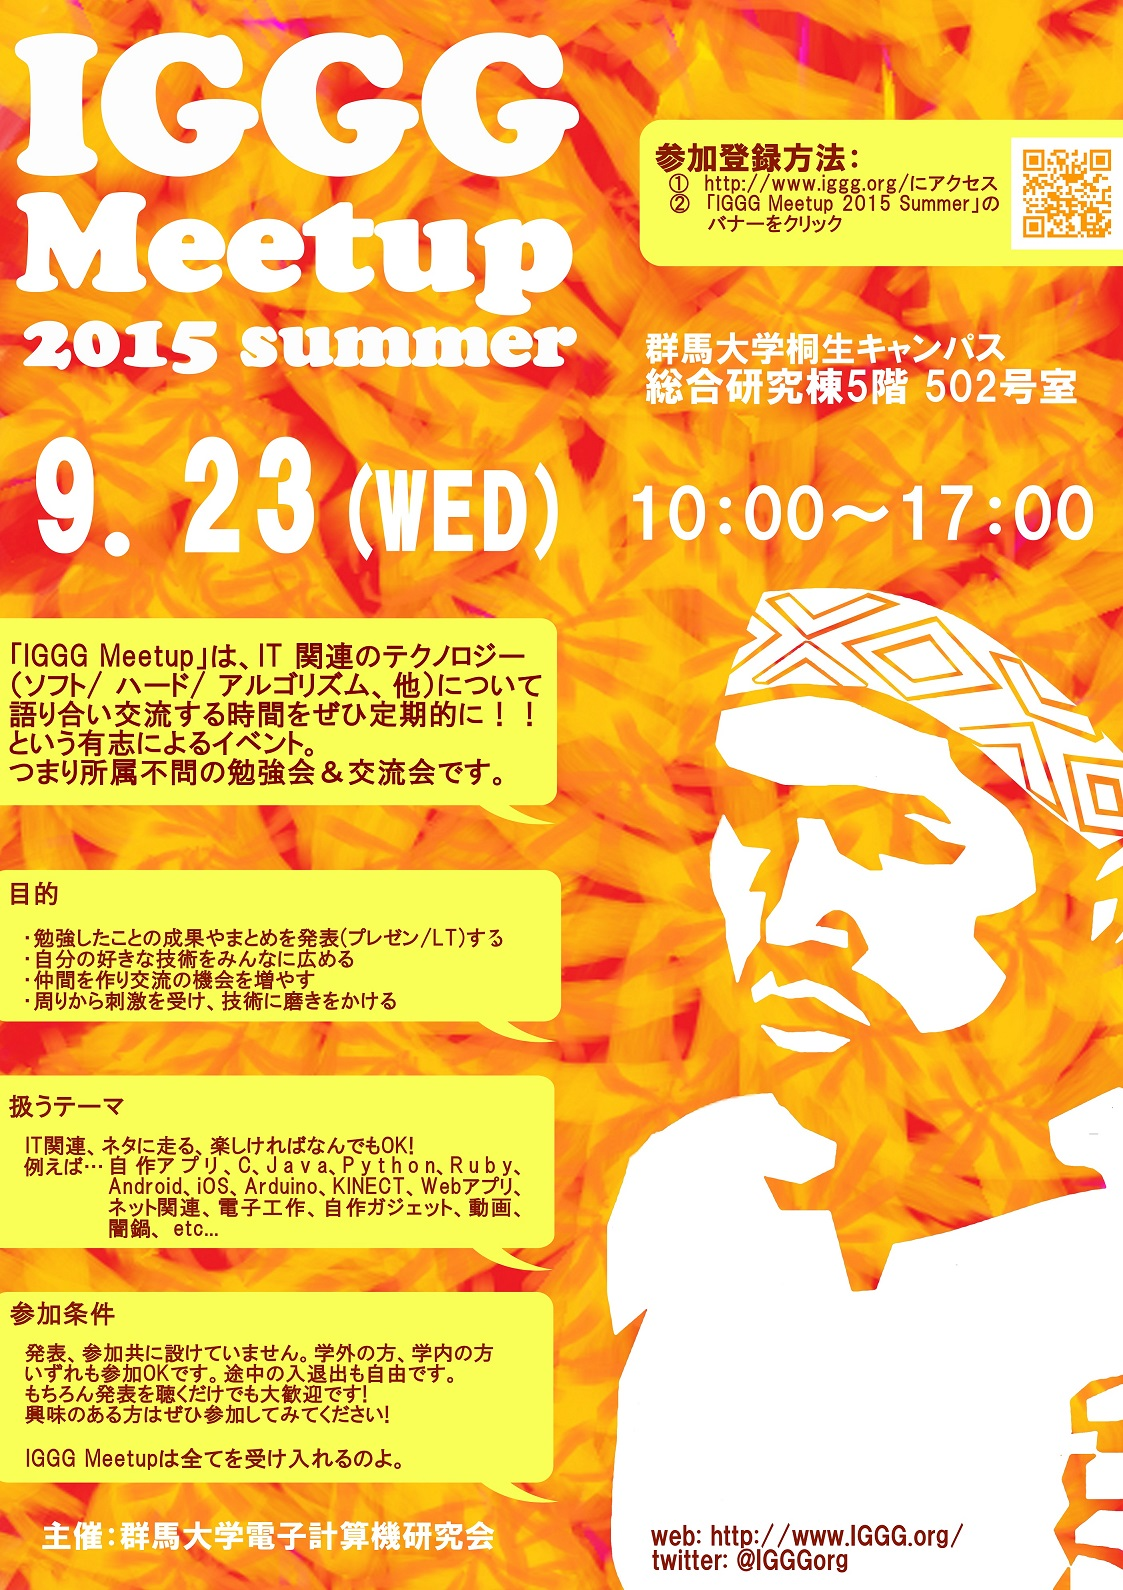 IGGG Meetup 2015 Summer ポスター